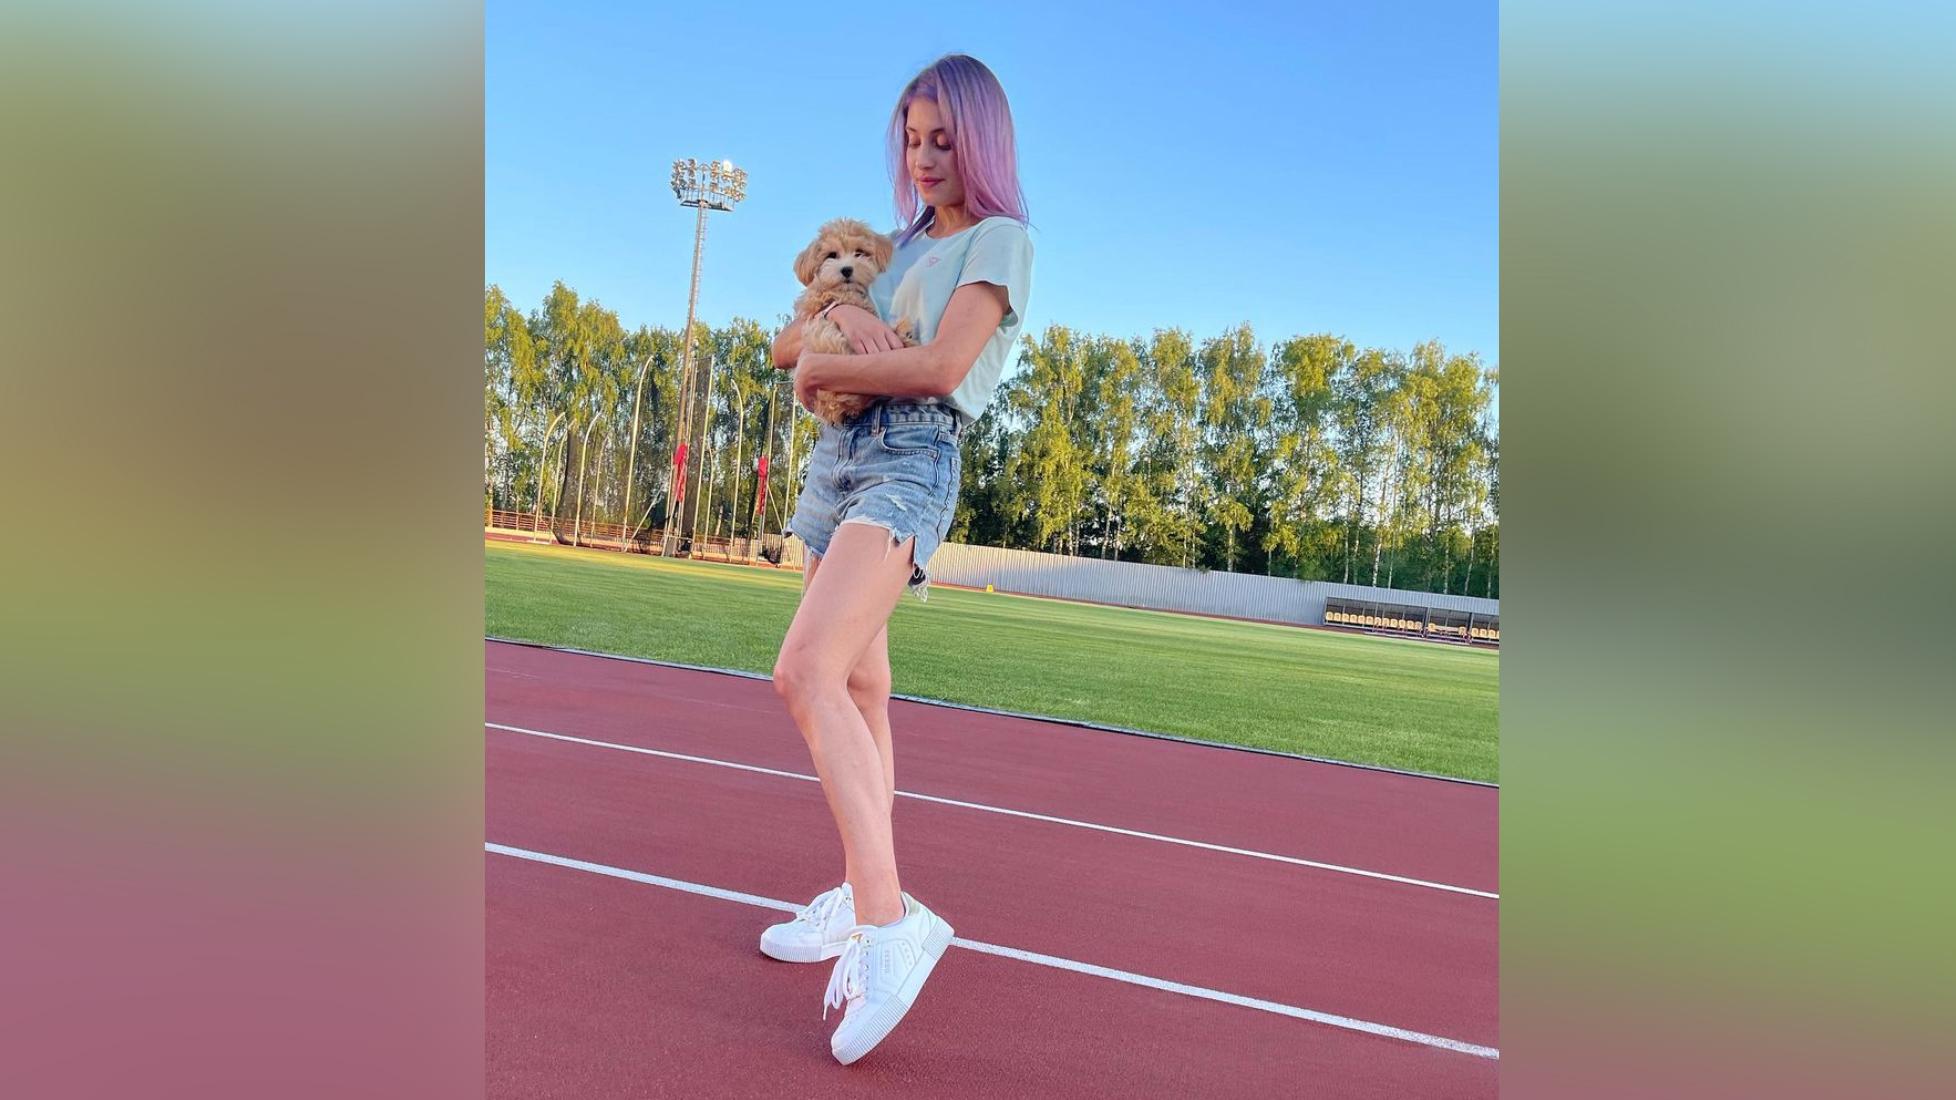 Алёна Косторная. Фото © Instagram / aliona_officialnew